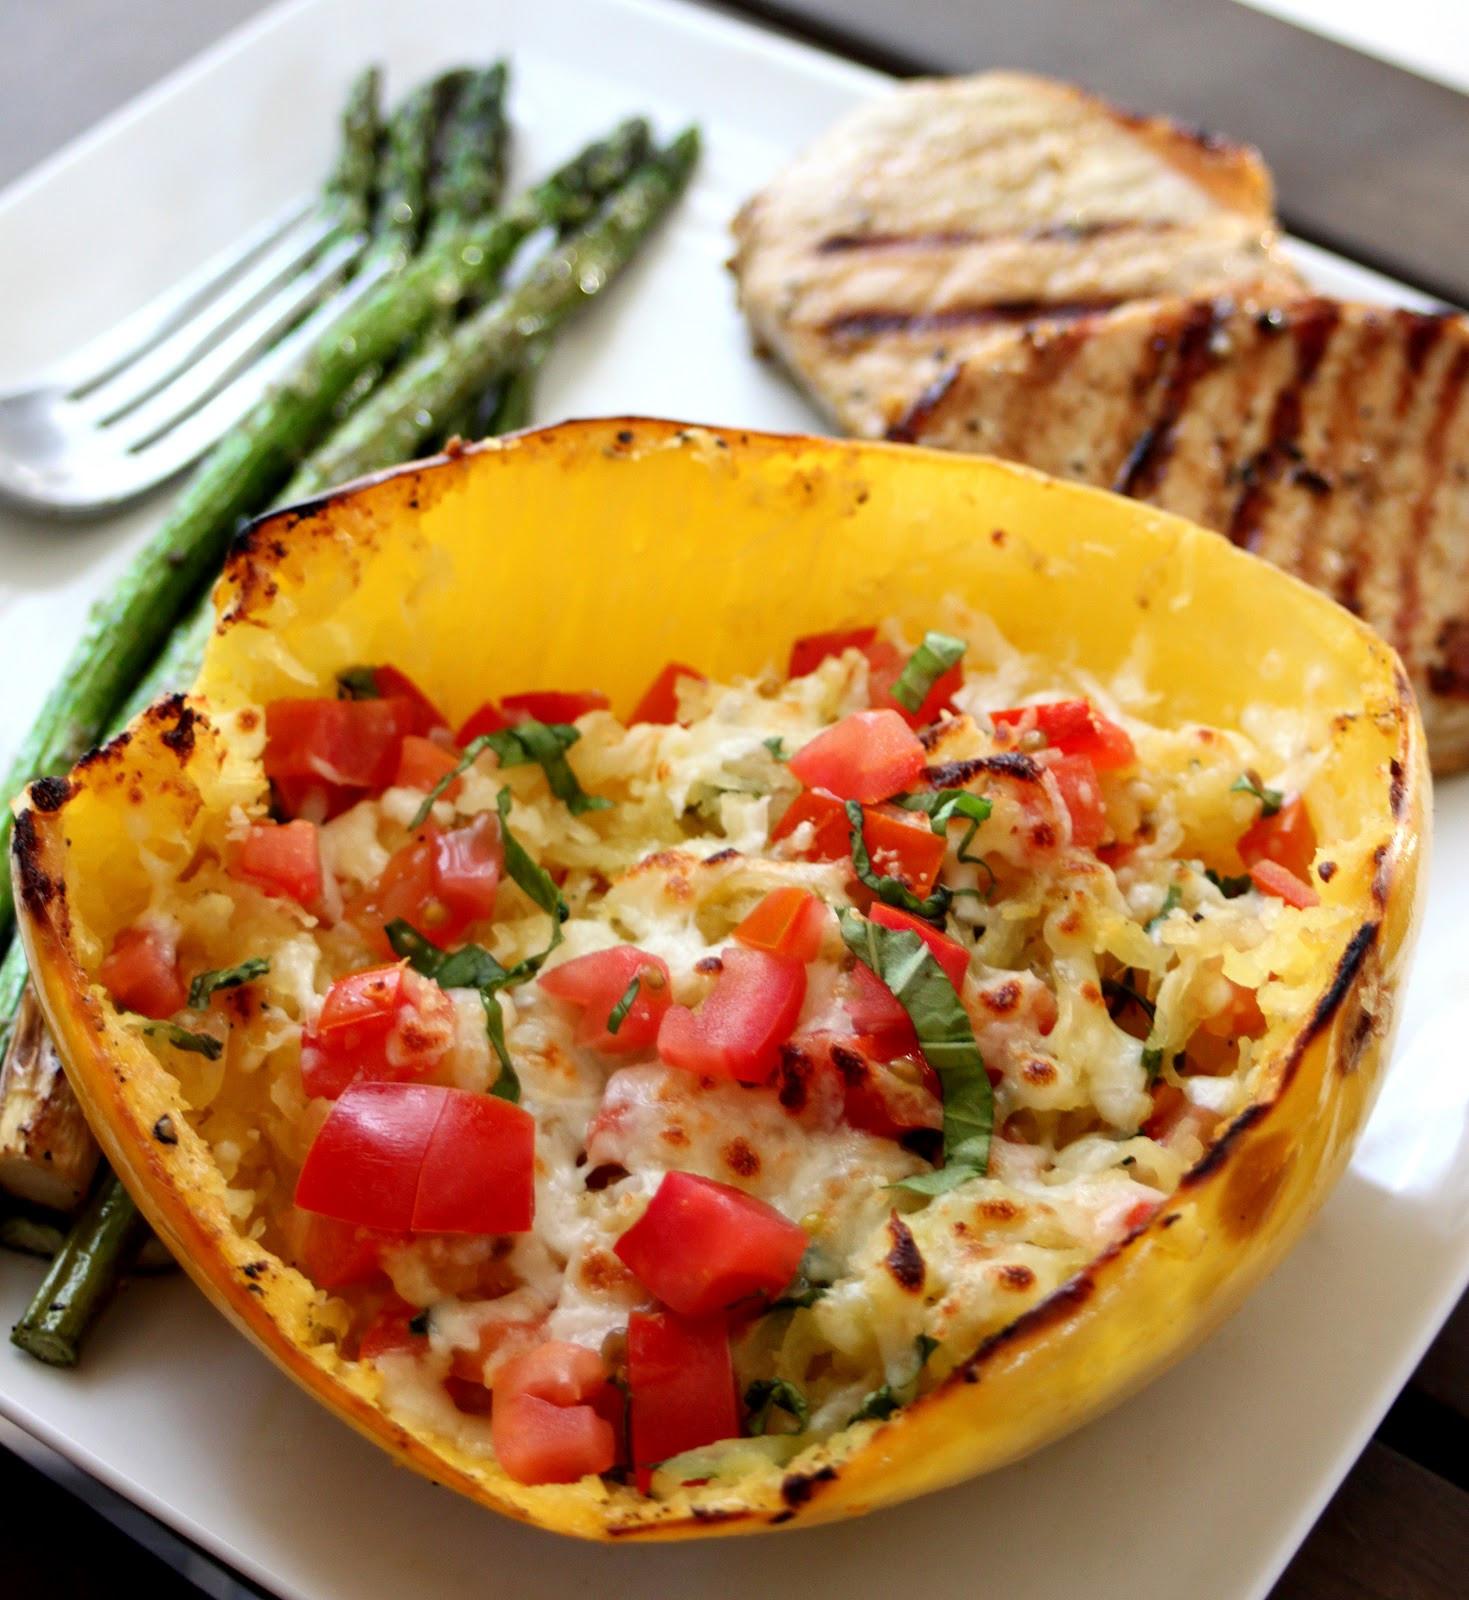 Spaghetti Squash Healthy  Phoenix Family Foo Blog Gluten Free Goodness Baked